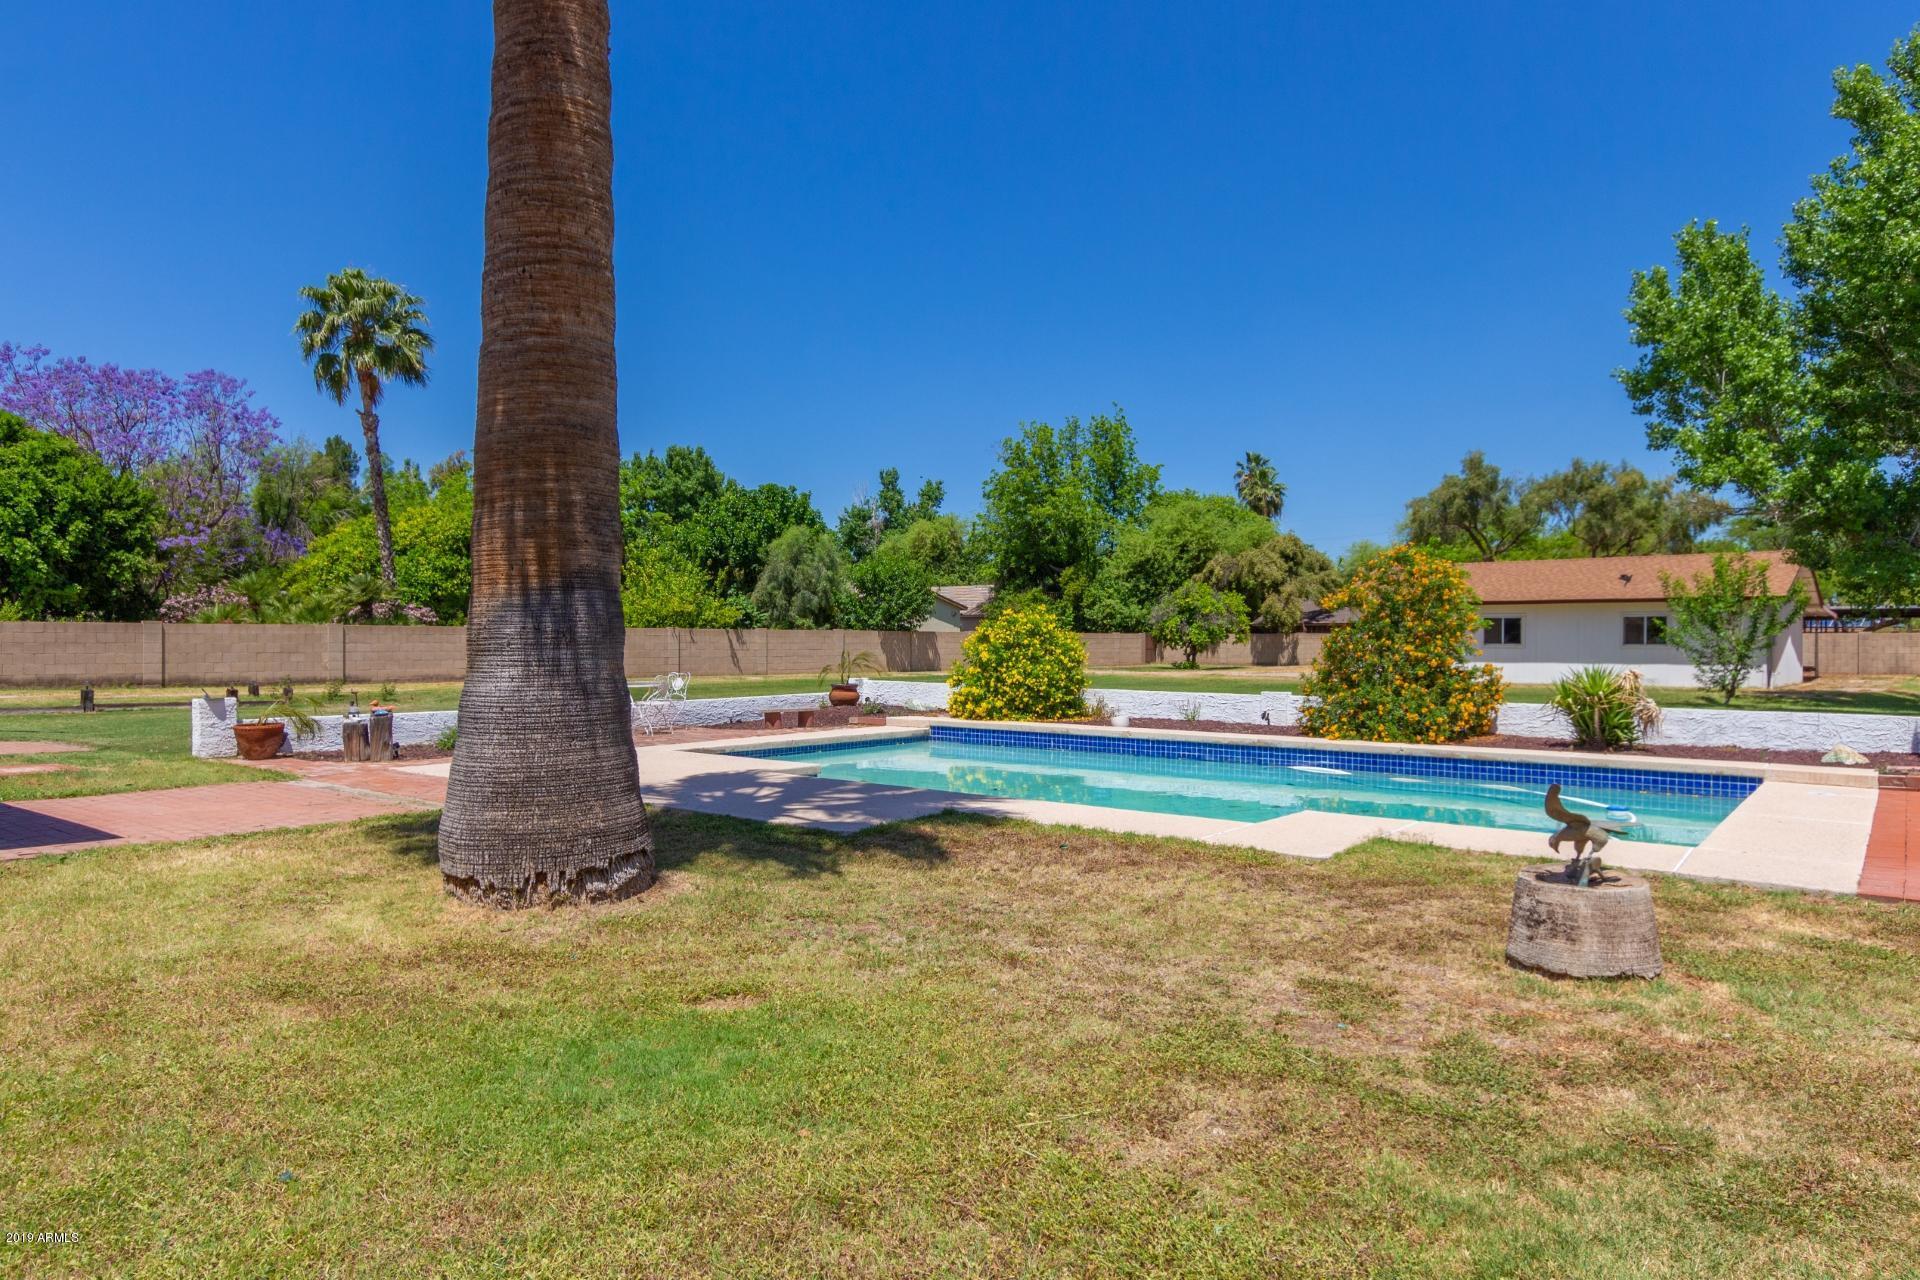 MLS 5923302 5716 W POINSETTIA Drive, Glendale, AZ 85304 Glendale AZ North Glendale